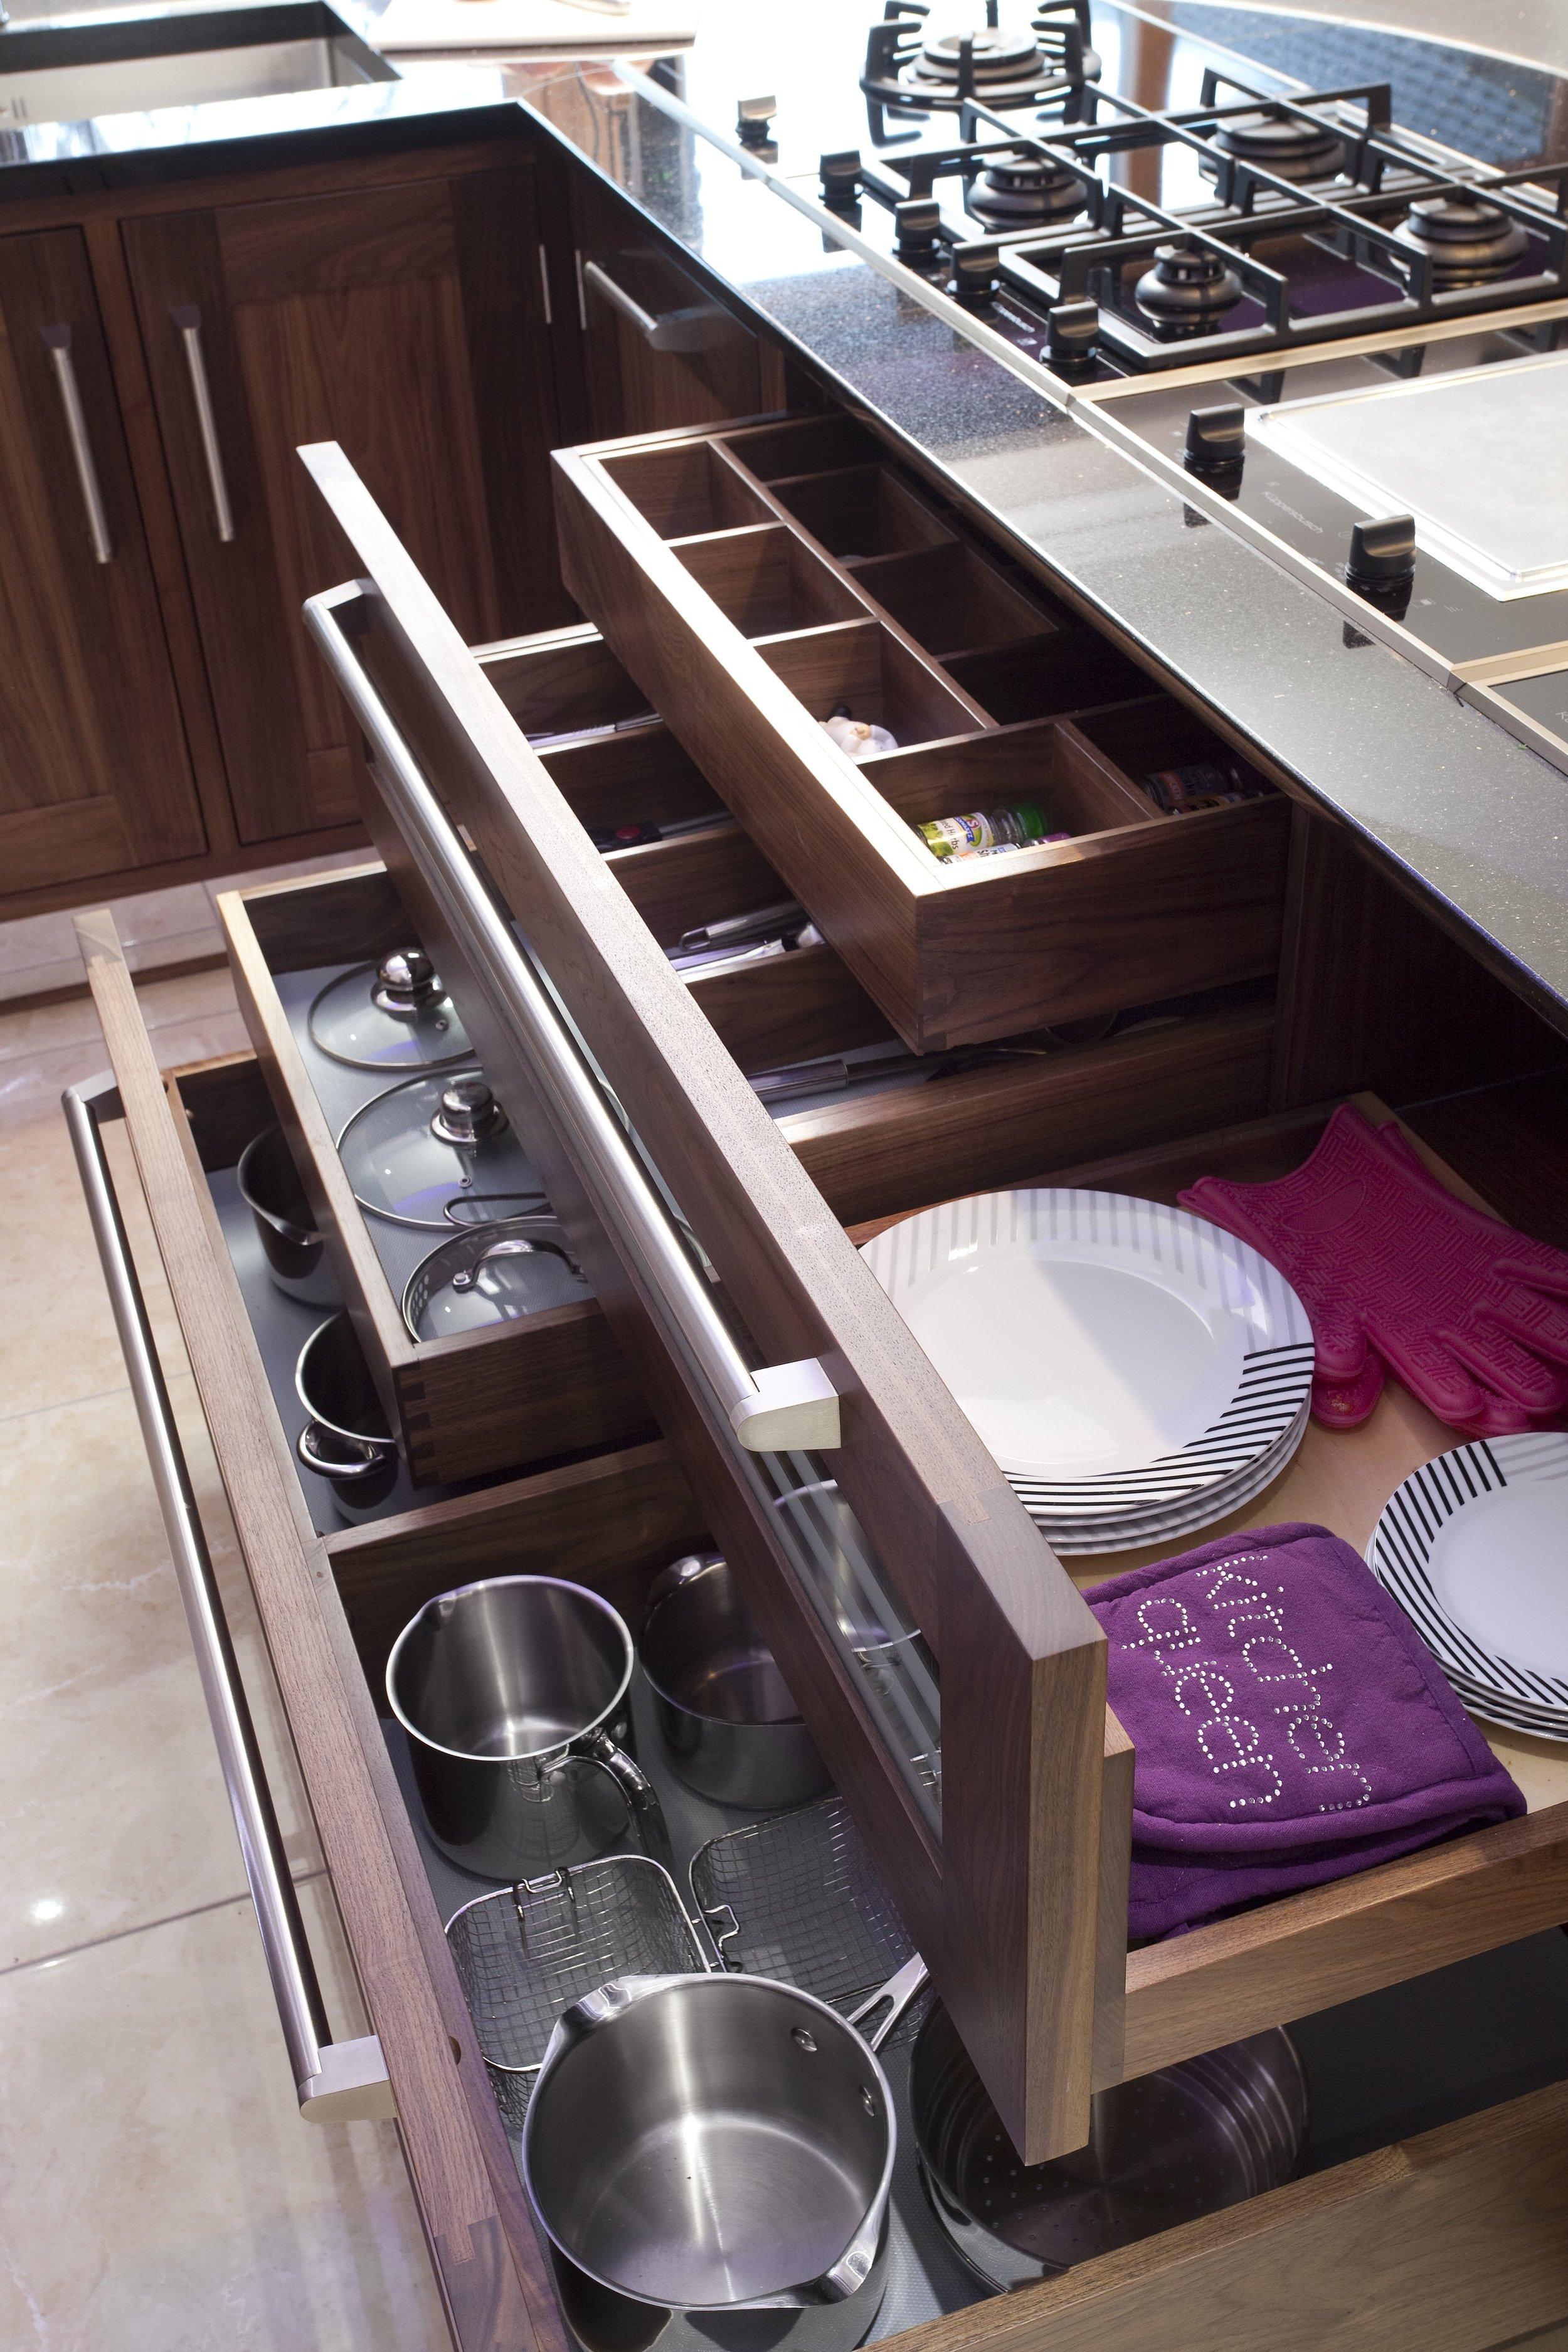 SH -007 -Walnut kitchen.jpg